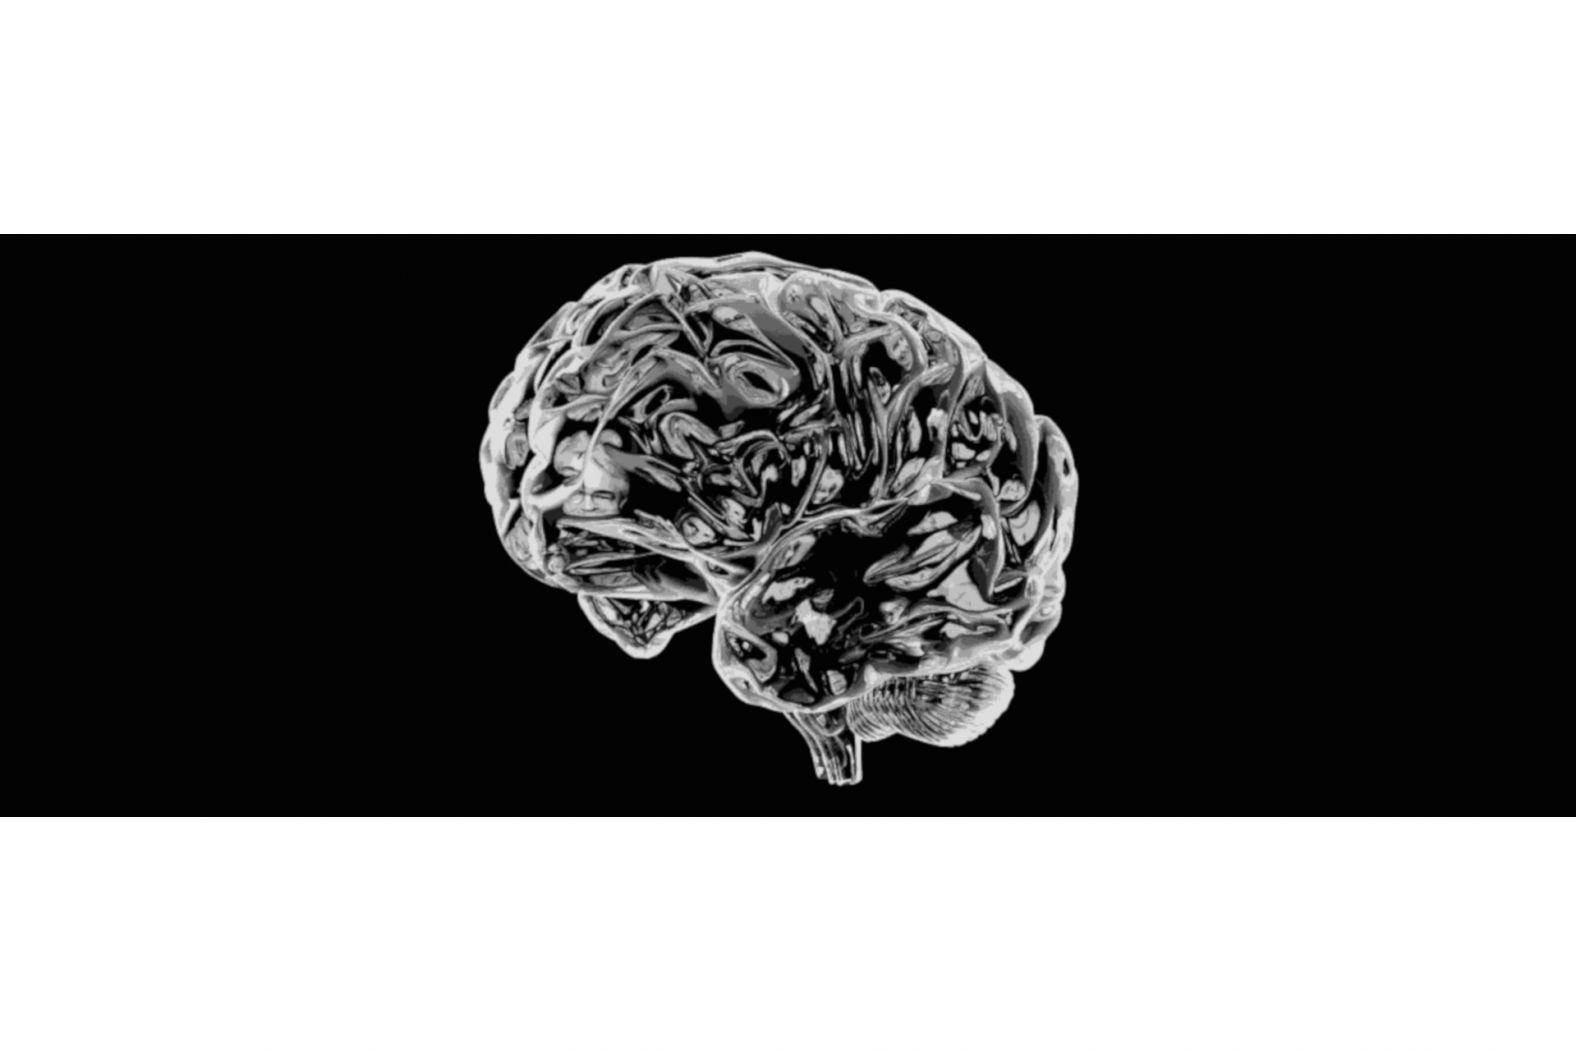 20191216_WuV_Brain